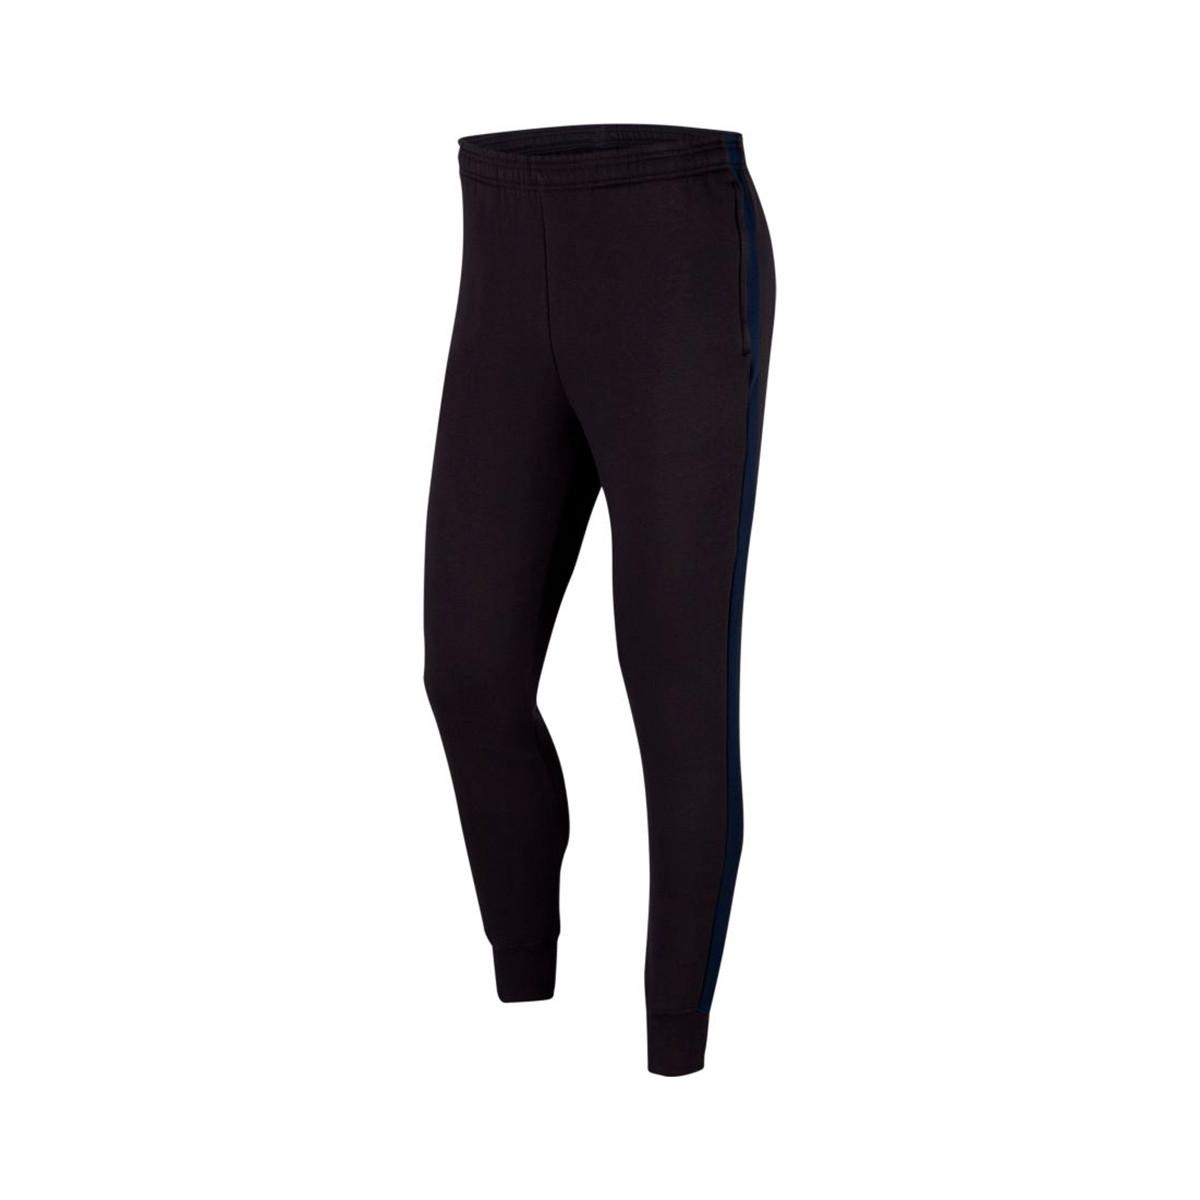 Long Pants Nike Paris Saint Germain Gfa 2019 2020 Oil Grey Obsidian Oil Grey Football Store Futbol Emotion